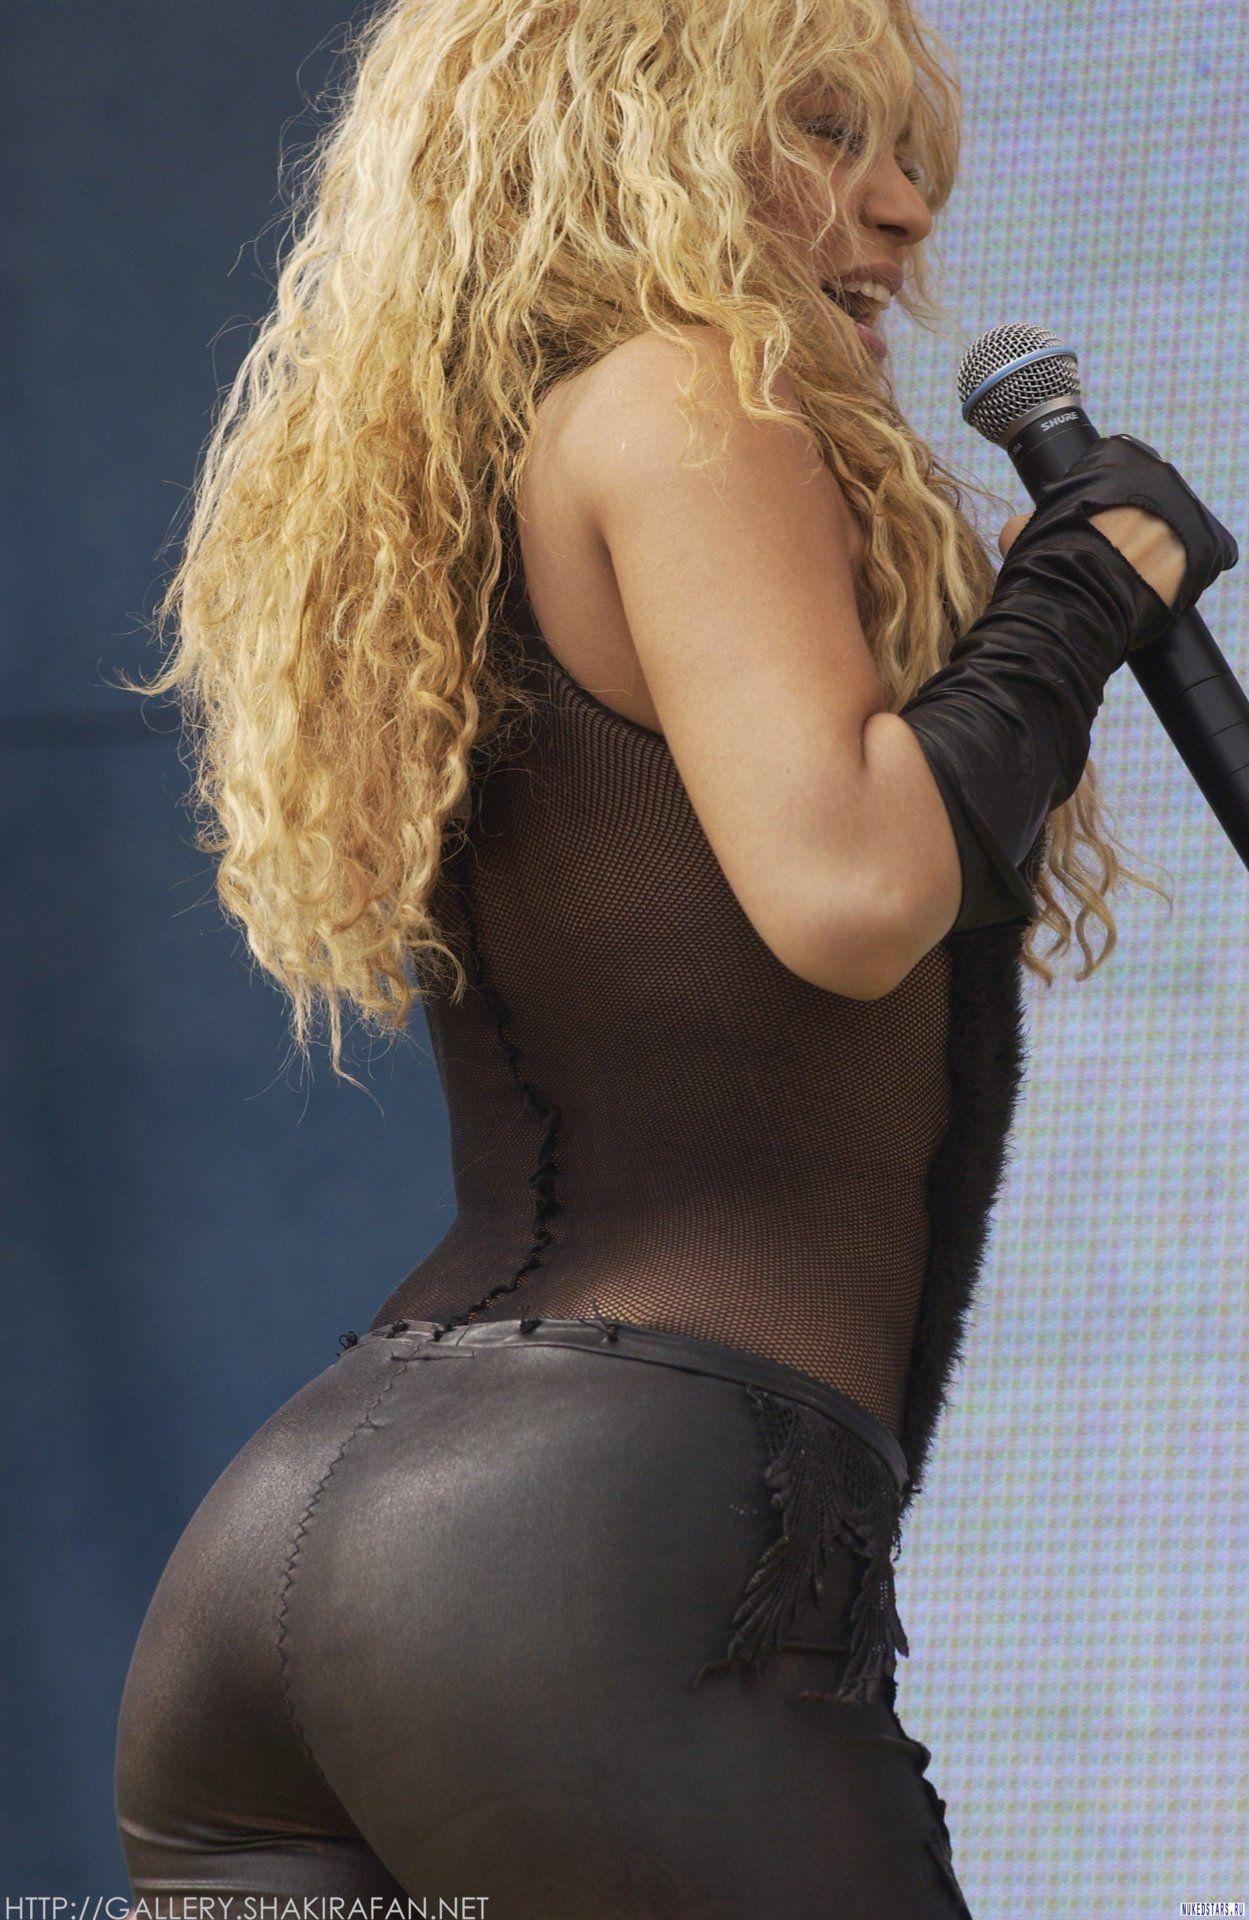 Booty Shakira nude (77 photos), Pussy, Leaked, Selfie, swimsuit 2019